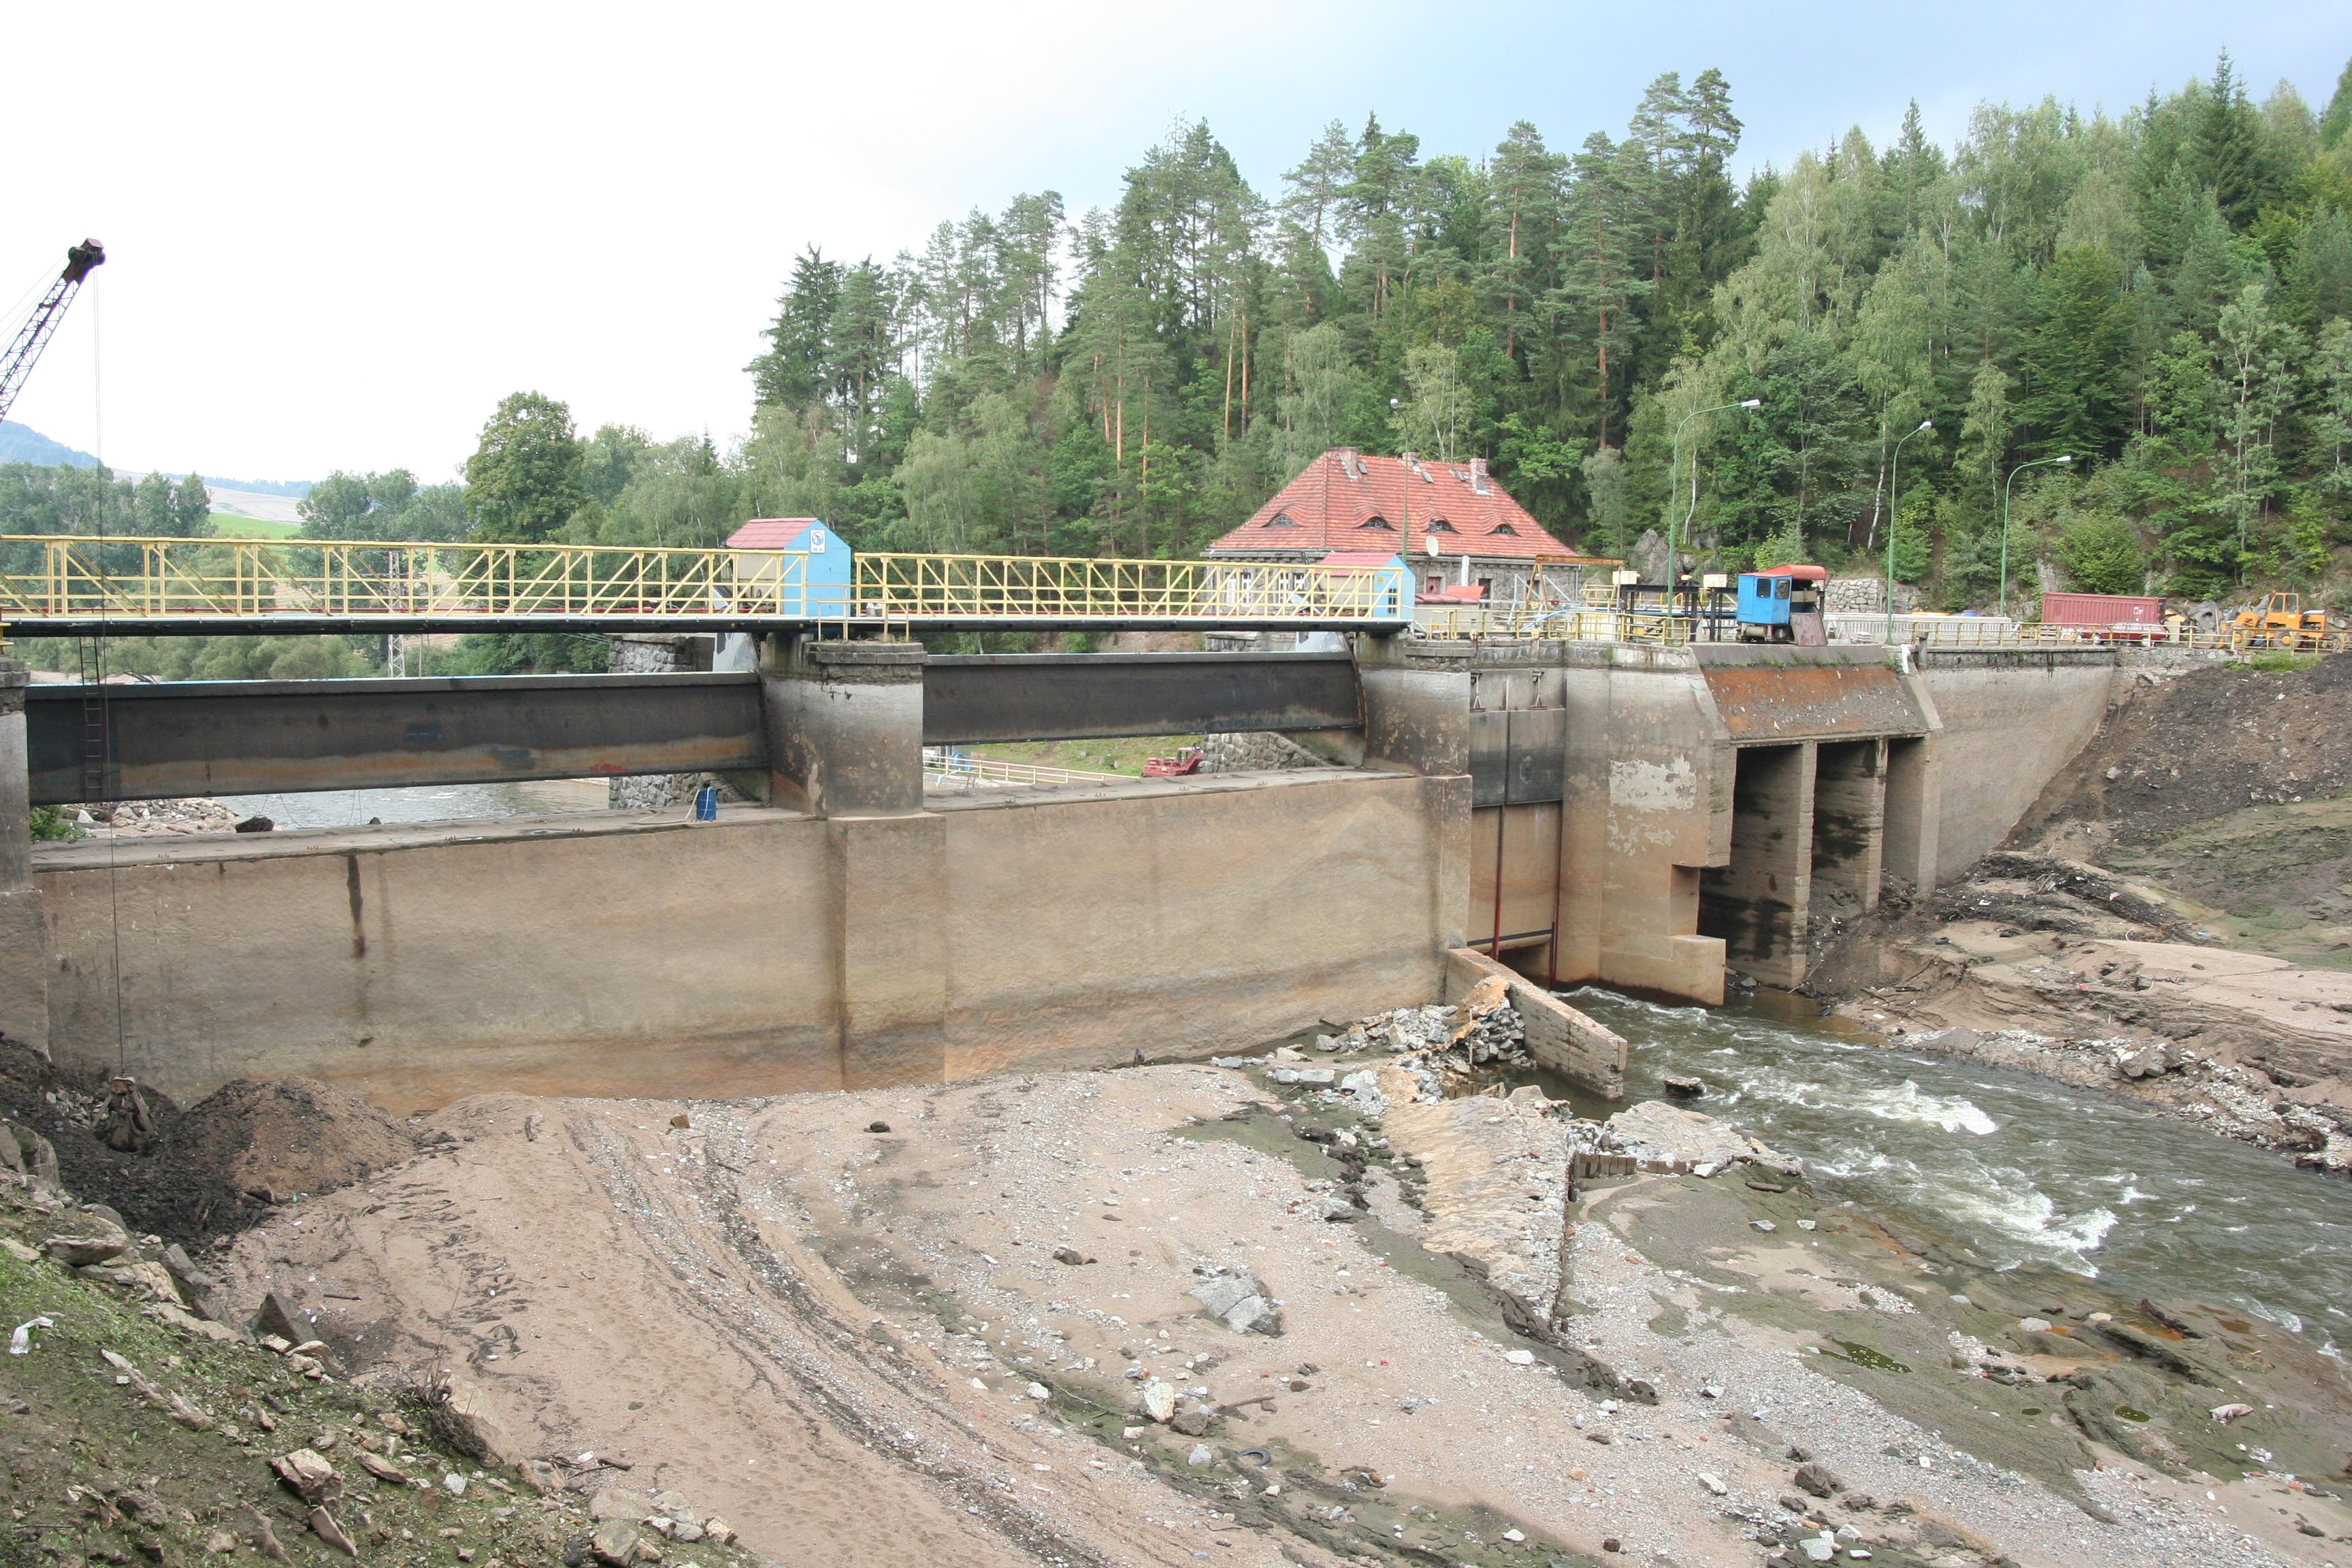 Bobr_river_emptied_Modre_Lake_04.jpg